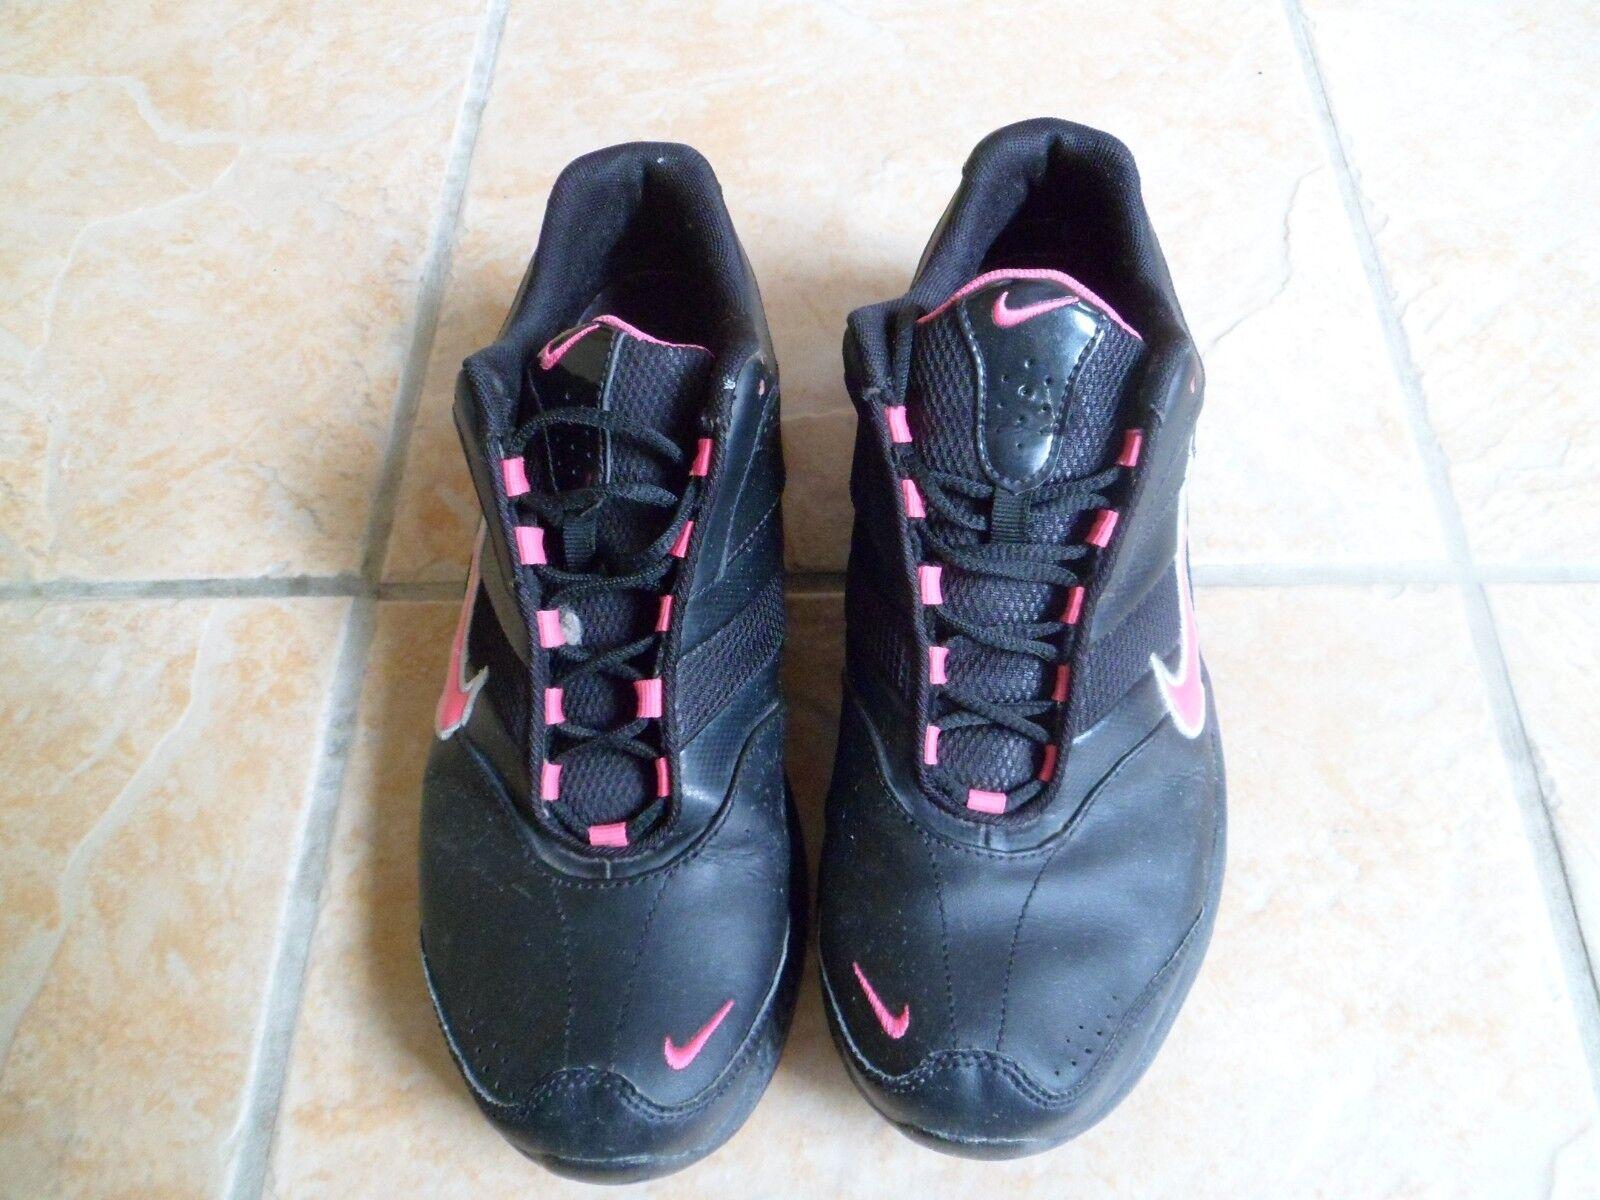 Nike bon Femme Noir/Rose Baskets Taille 5.5 très bon Nike état 228f4a